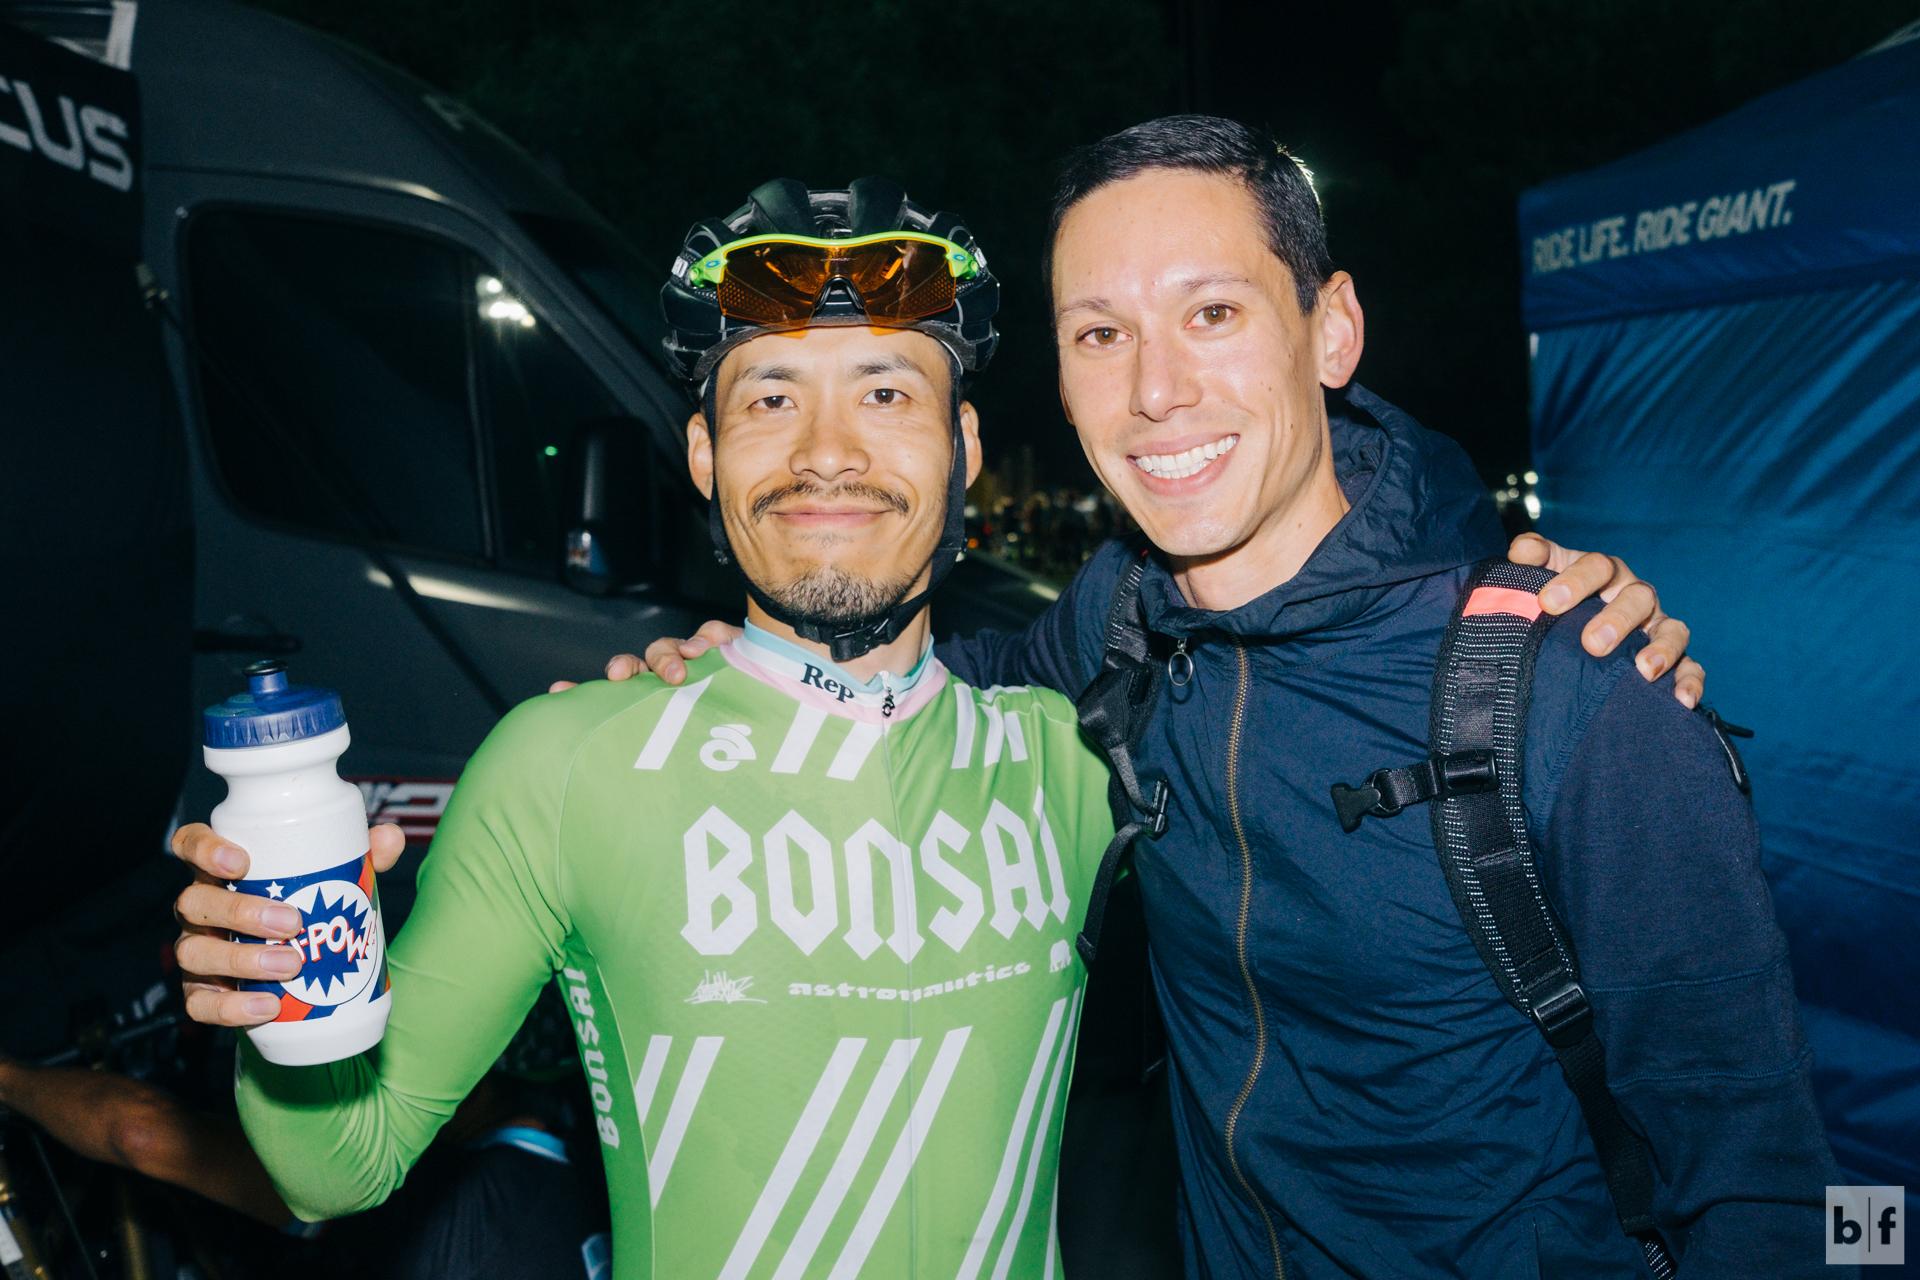 meeting a legend, Hideo Yoshida of Bonsai Cycle Works in Japan.